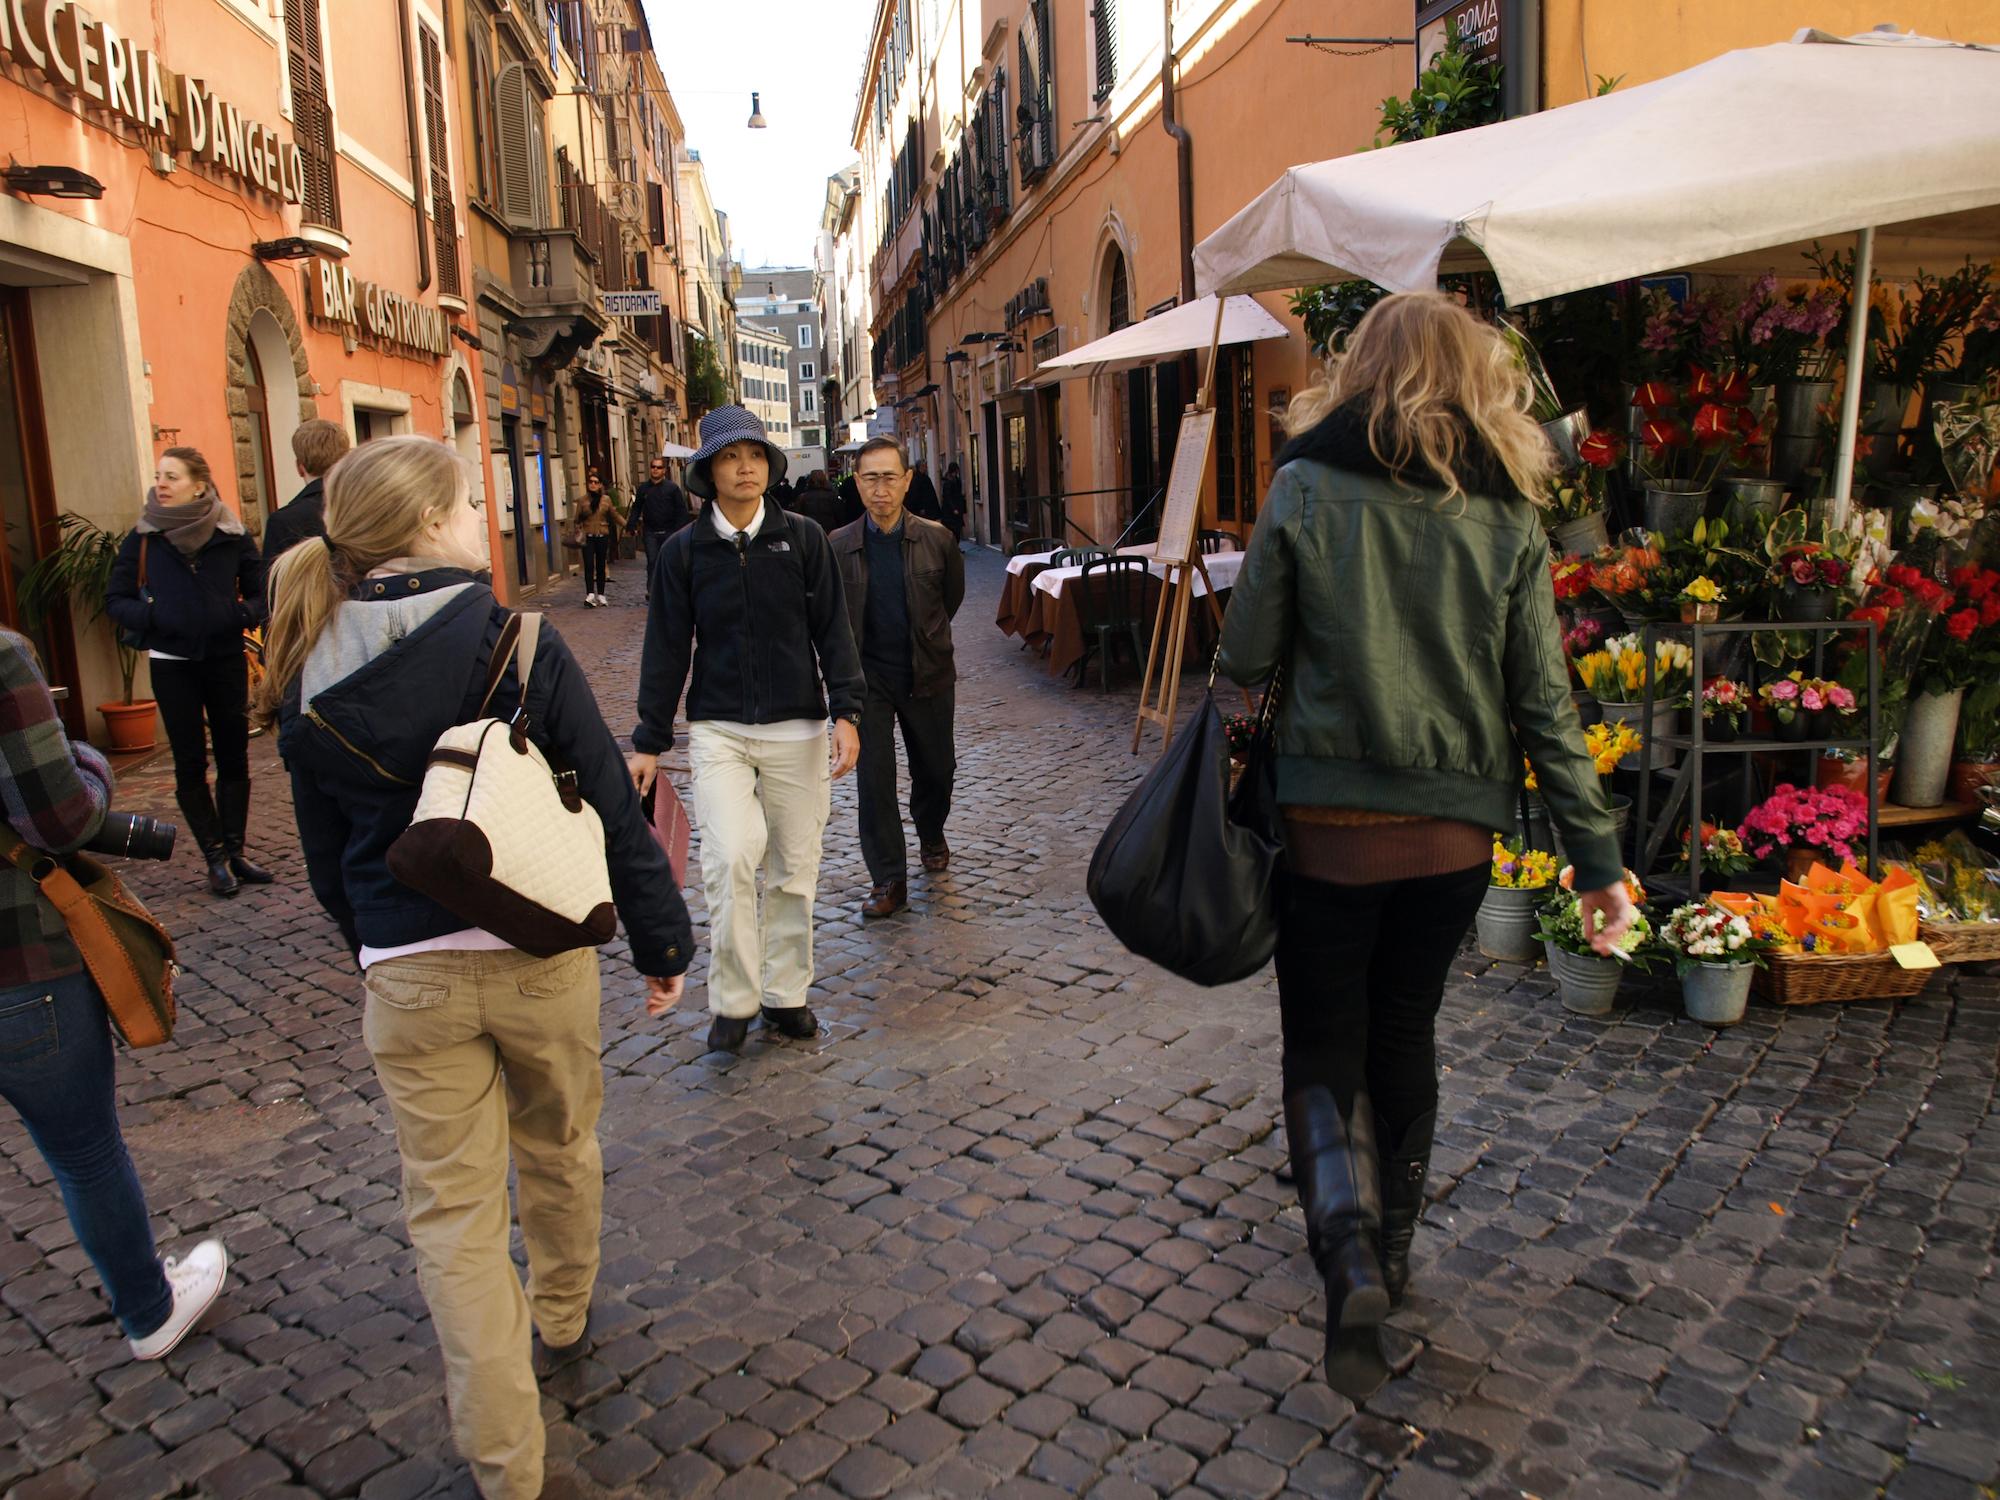 Via della Croce in Rome, Italy. Travel photography by Geena Matuson @geenamatuson #thegirlmirage.